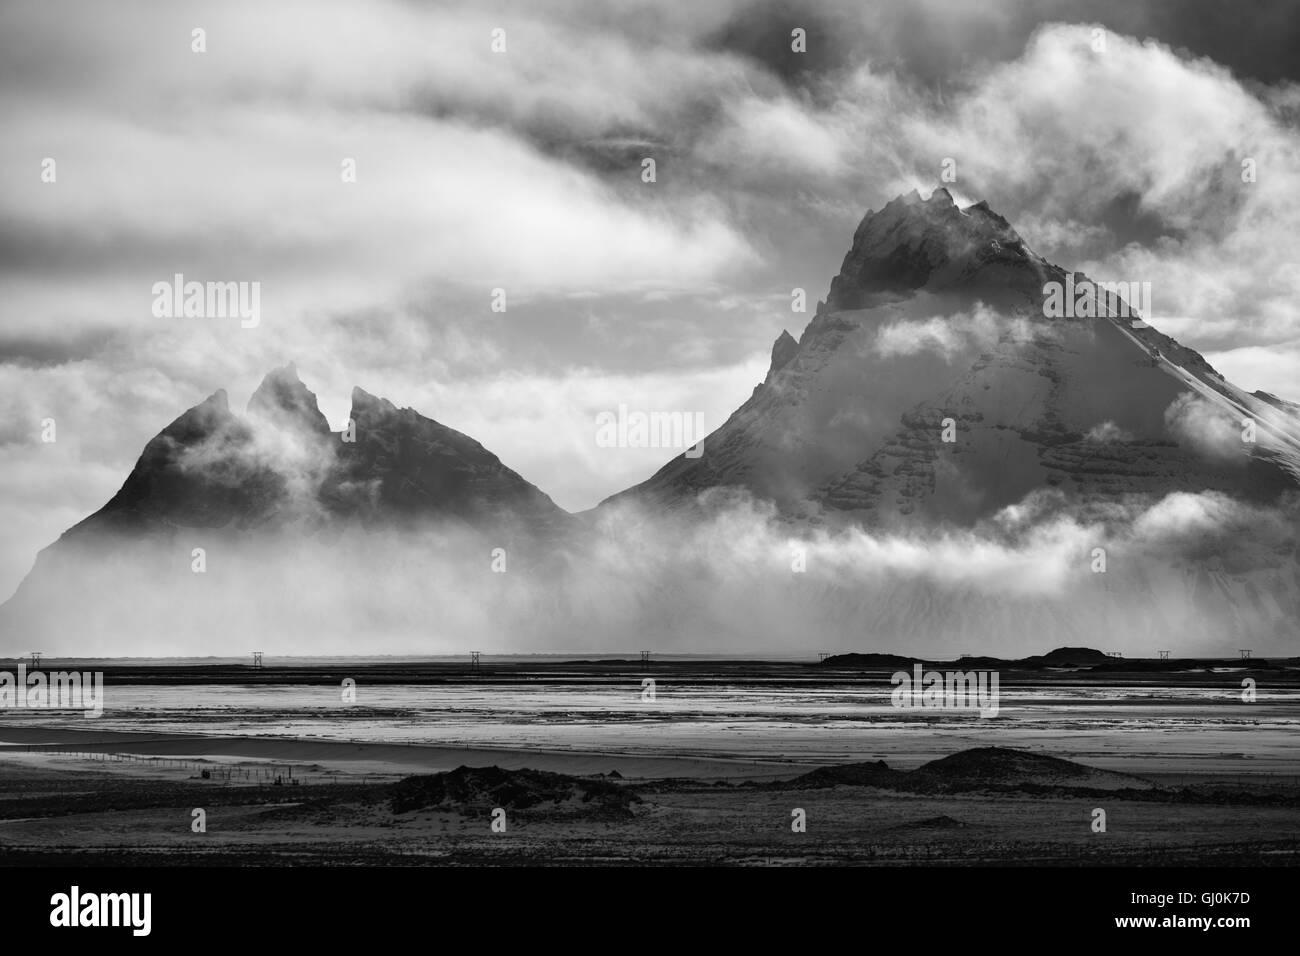 the mountains of the Stokksnes Peninsula, eastern Iceland - Stock Image